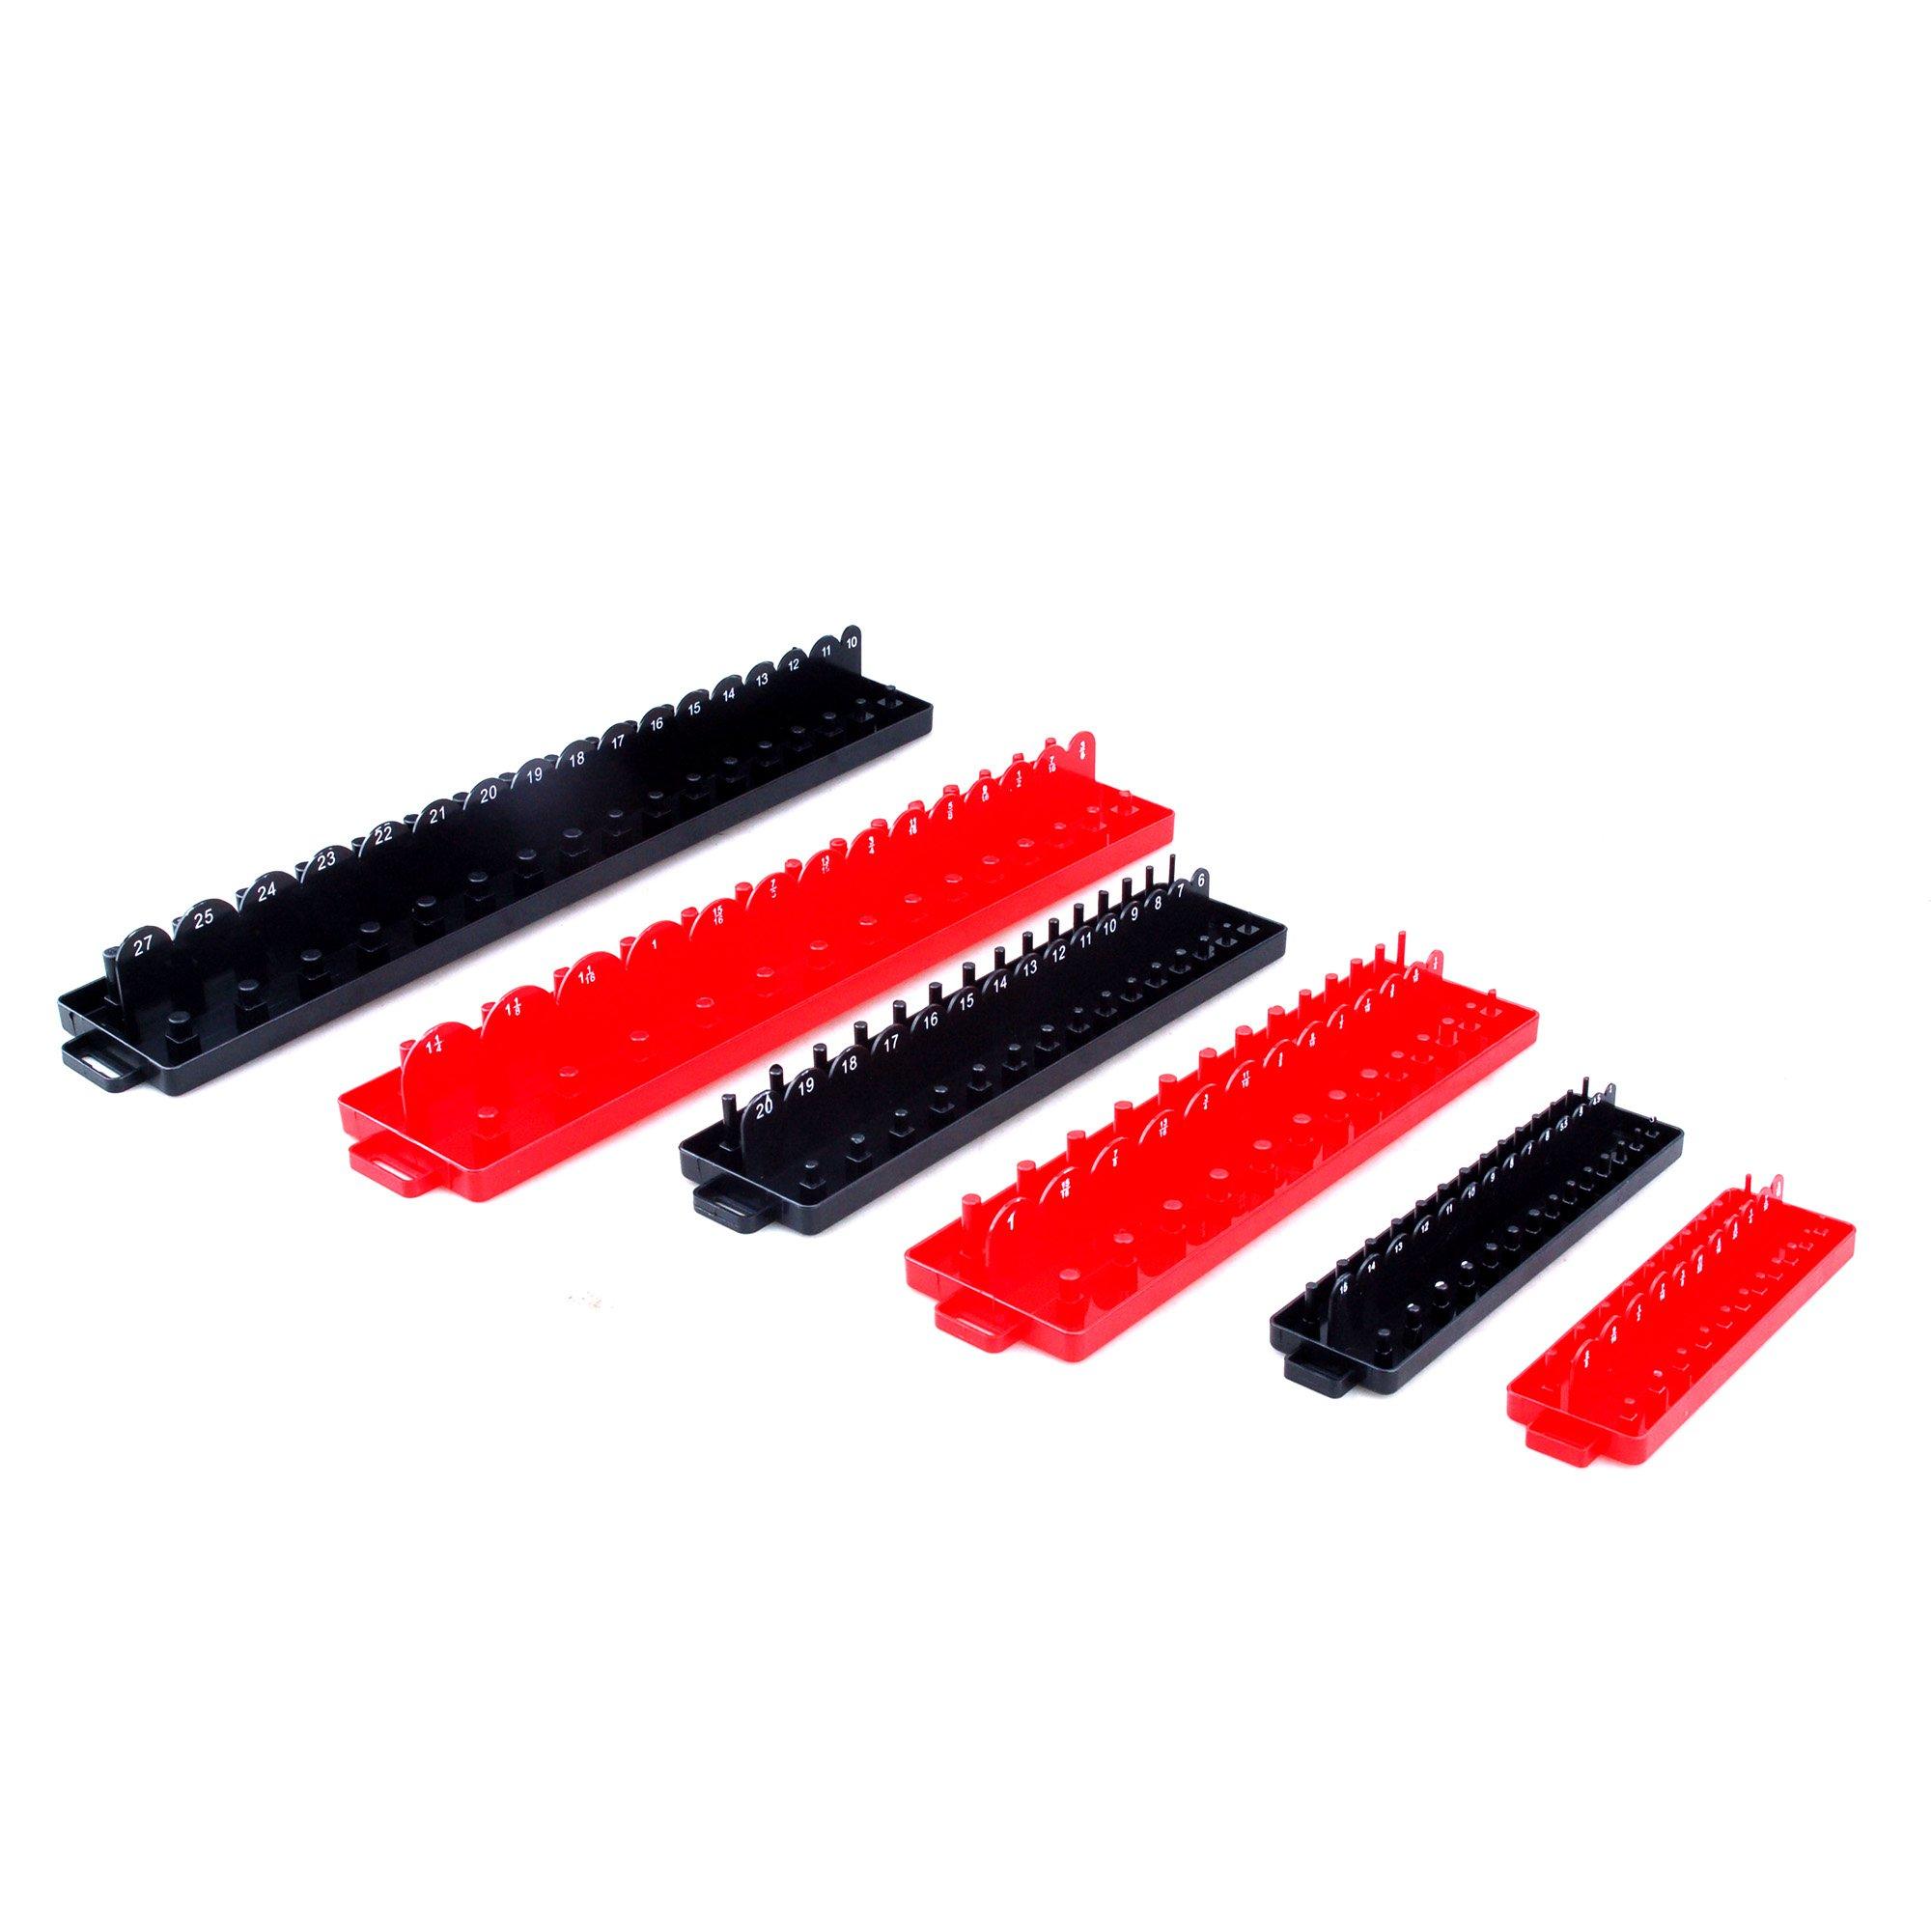 STEEL CORE 30113 6Pc Socket Tray/Organizer Set, SAE/Metric by STEEL CORE